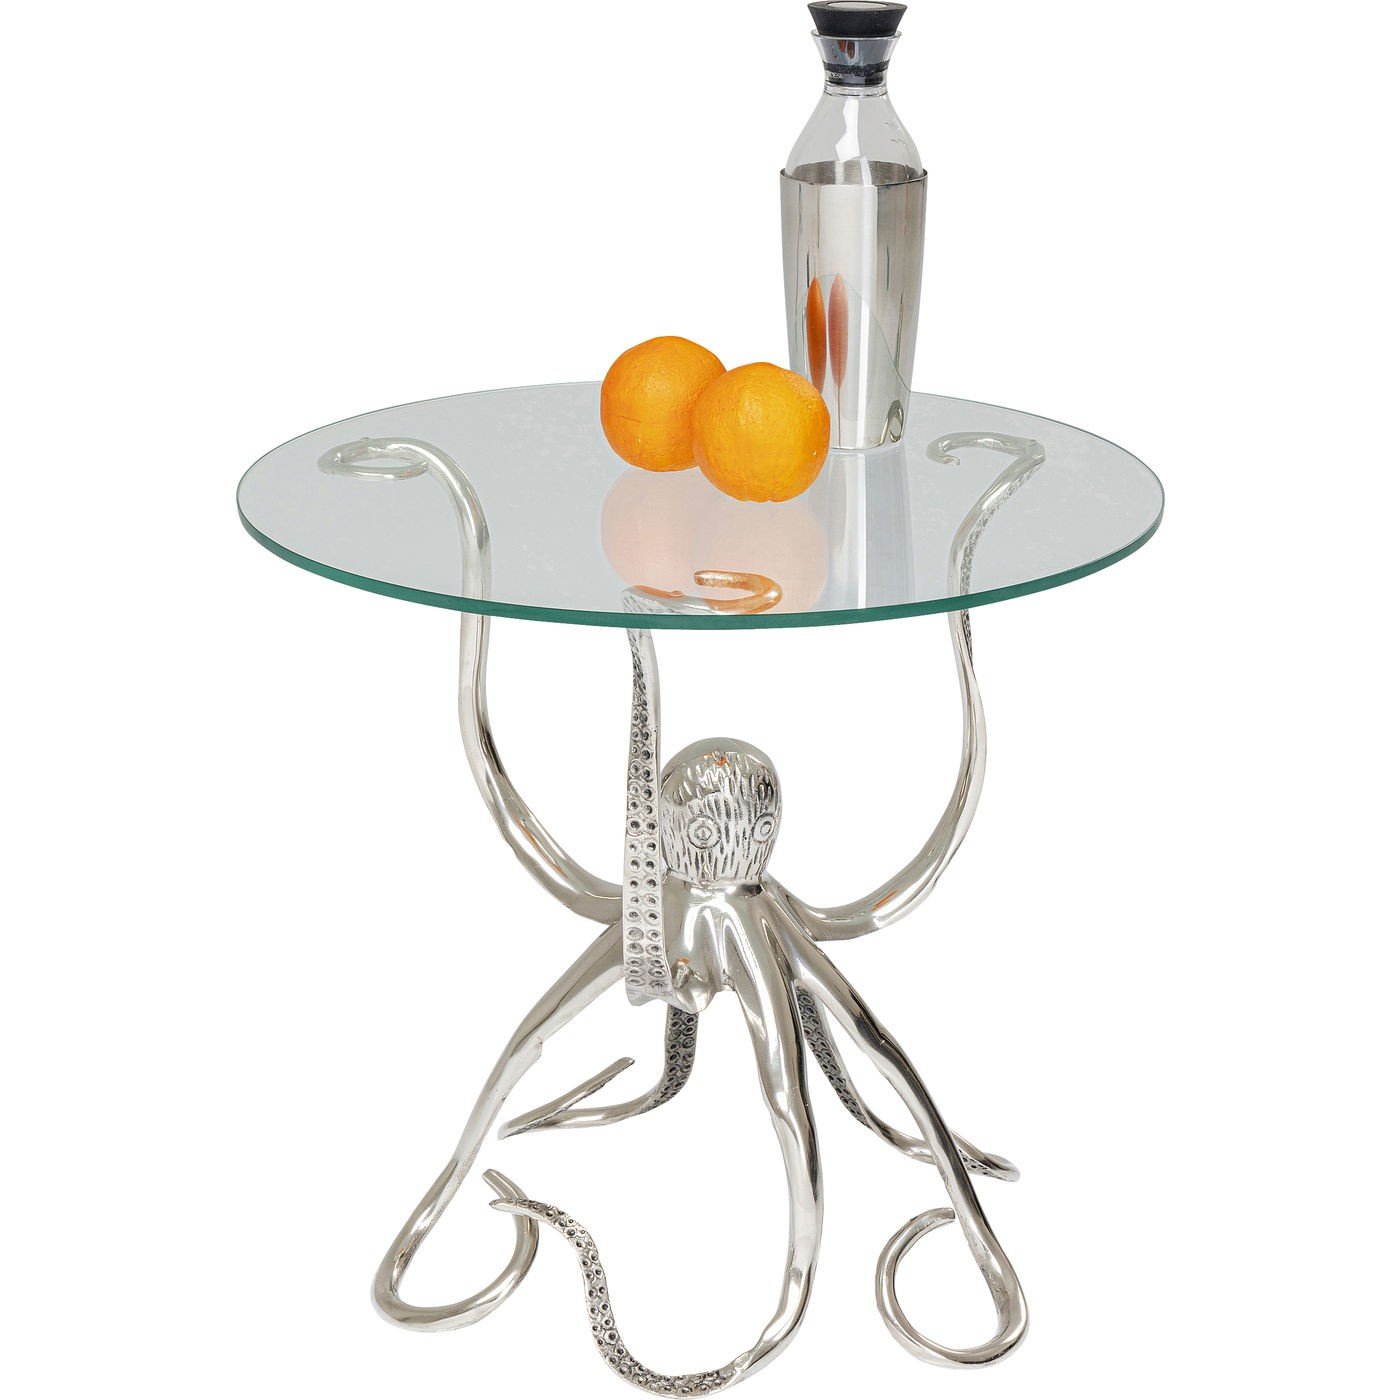 Table d'appoint Pieuvre 48cm Kare Design